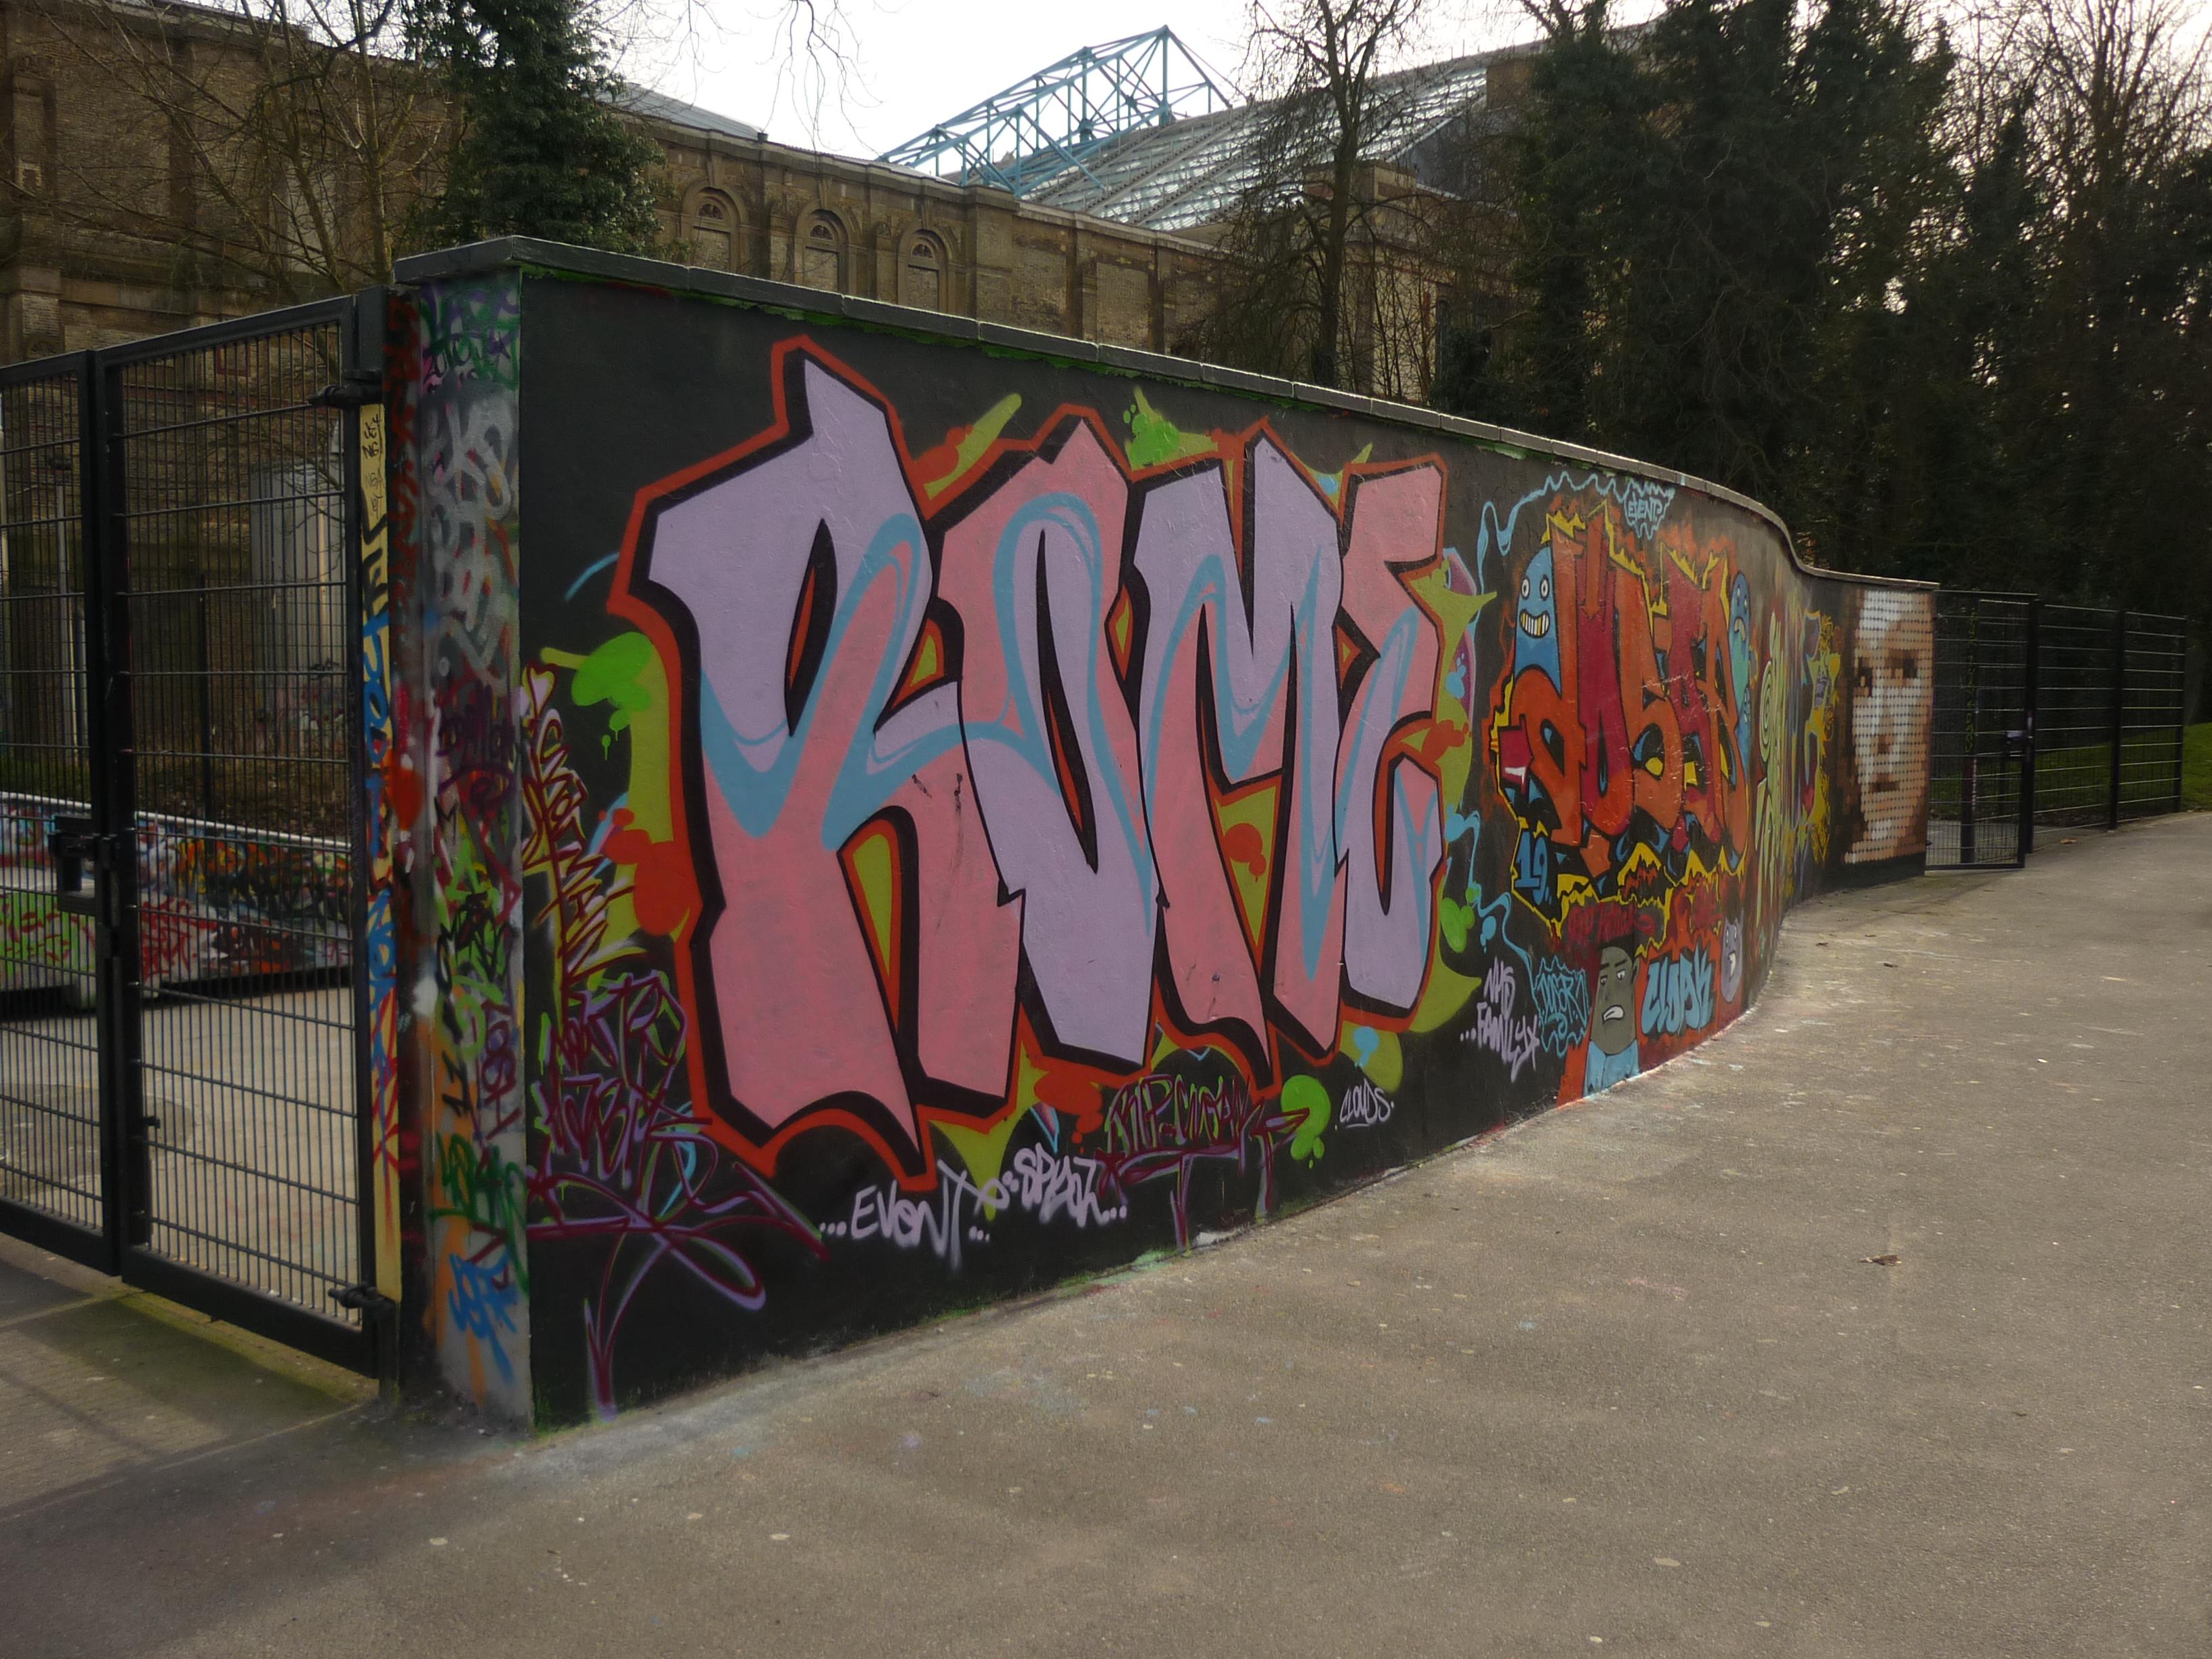 Filegraffiti wall alexandra park skatepark north london geograph org